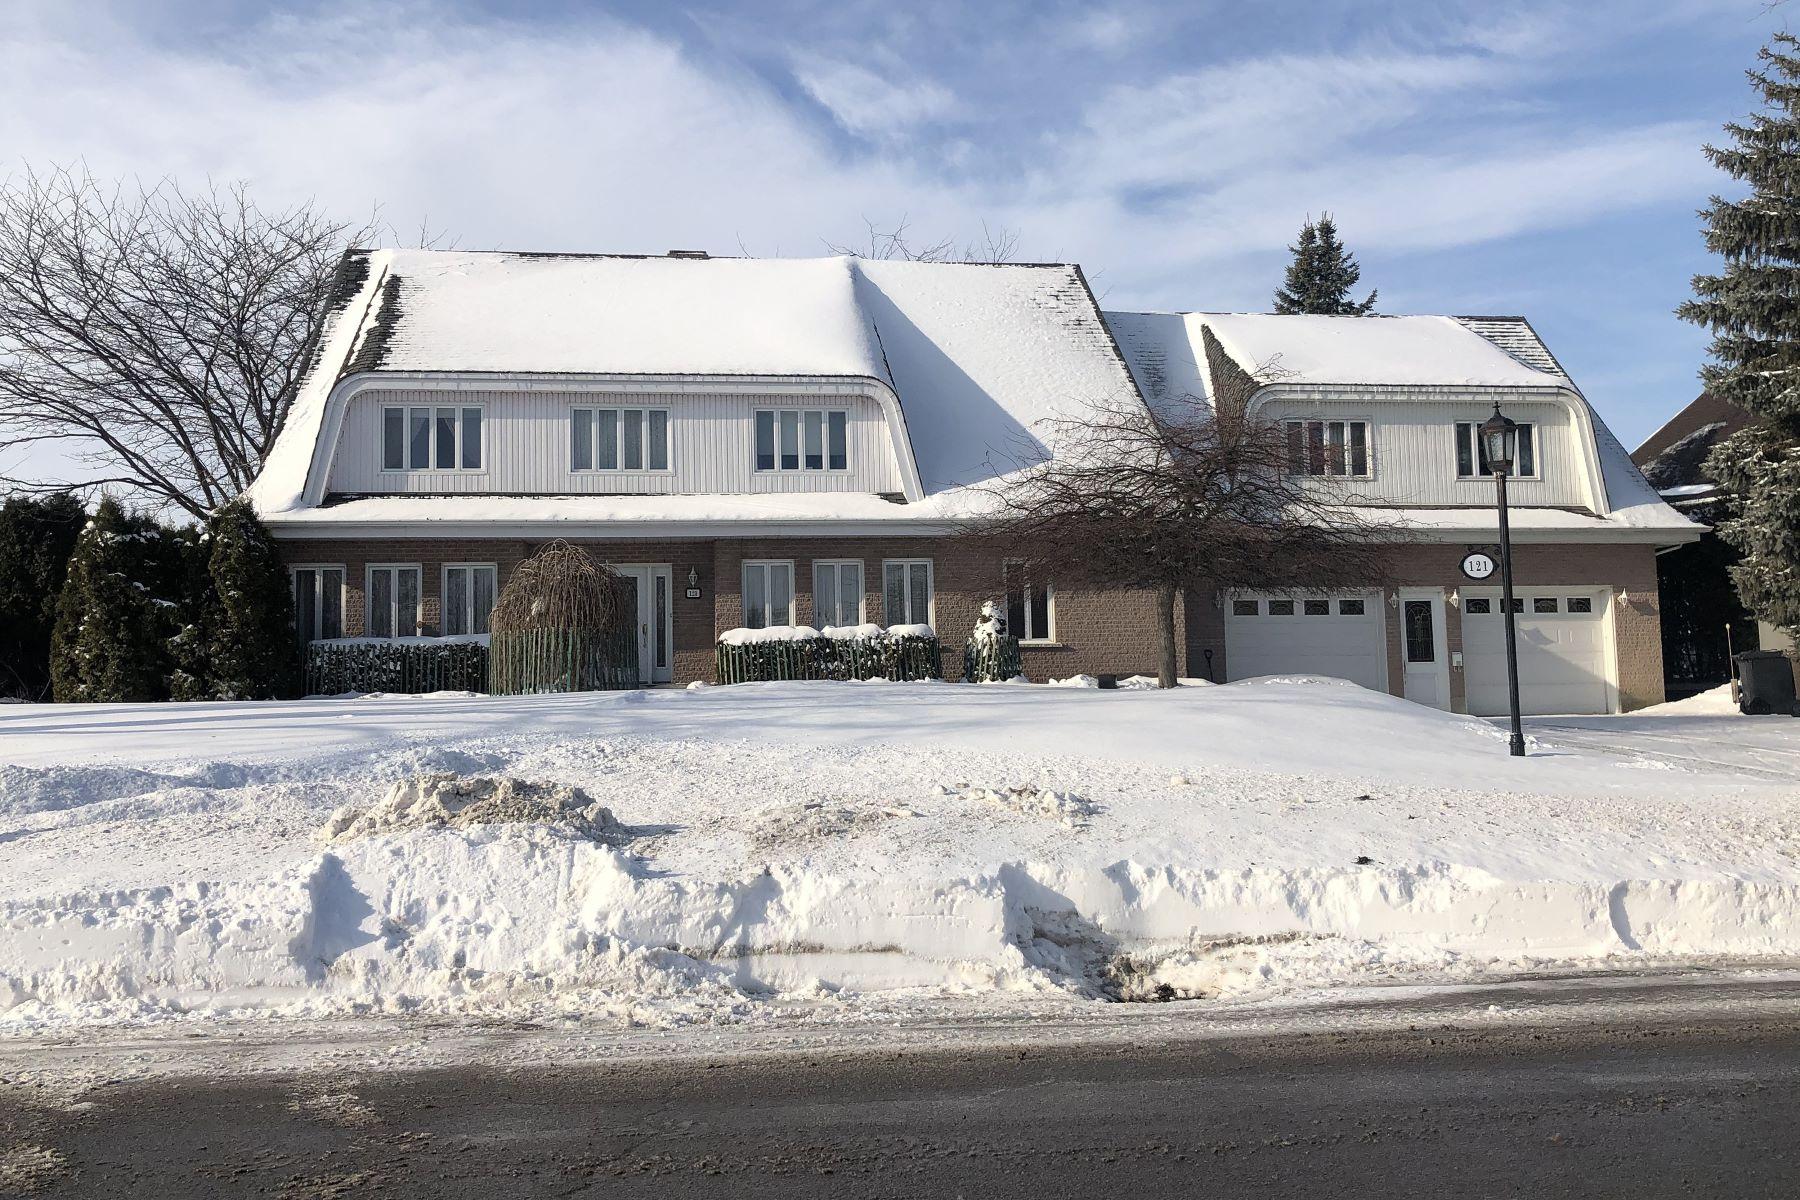 Single Family Homes for Sale at Léry, Montérégie 121 Rue Asselin Lery, Quebec J6N3N6 Canada